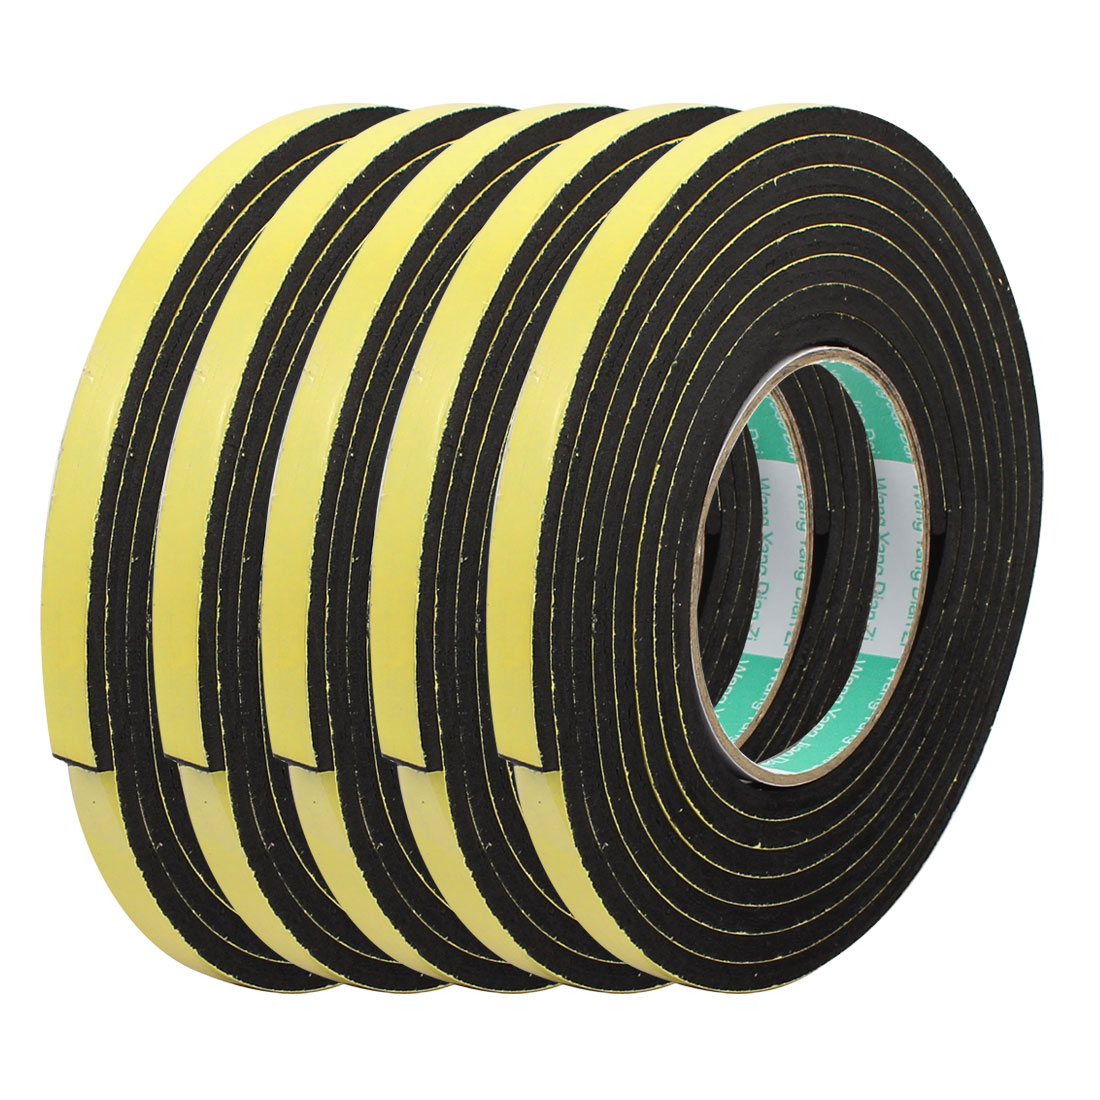 5pcs 3Meter 10mm x 5mm Single-side Adhesive Shockproof Sponge Foam Tape Yellow